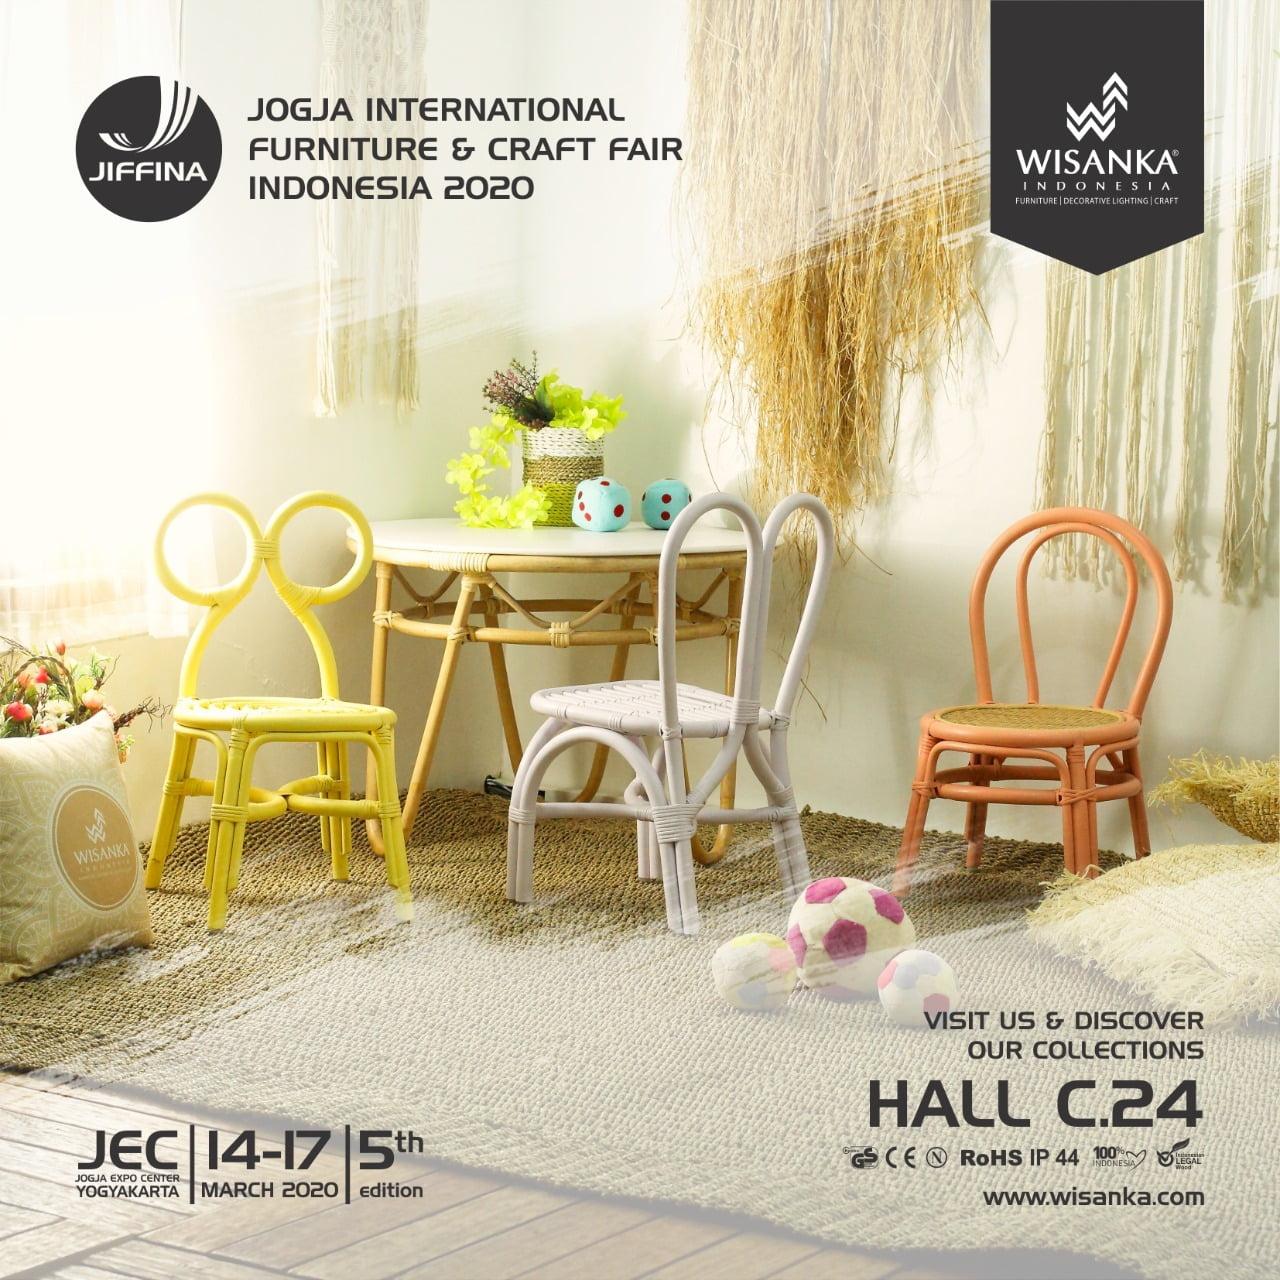 Jiffina 2020 Jogja International Furniture And Craft Fair Indonesia